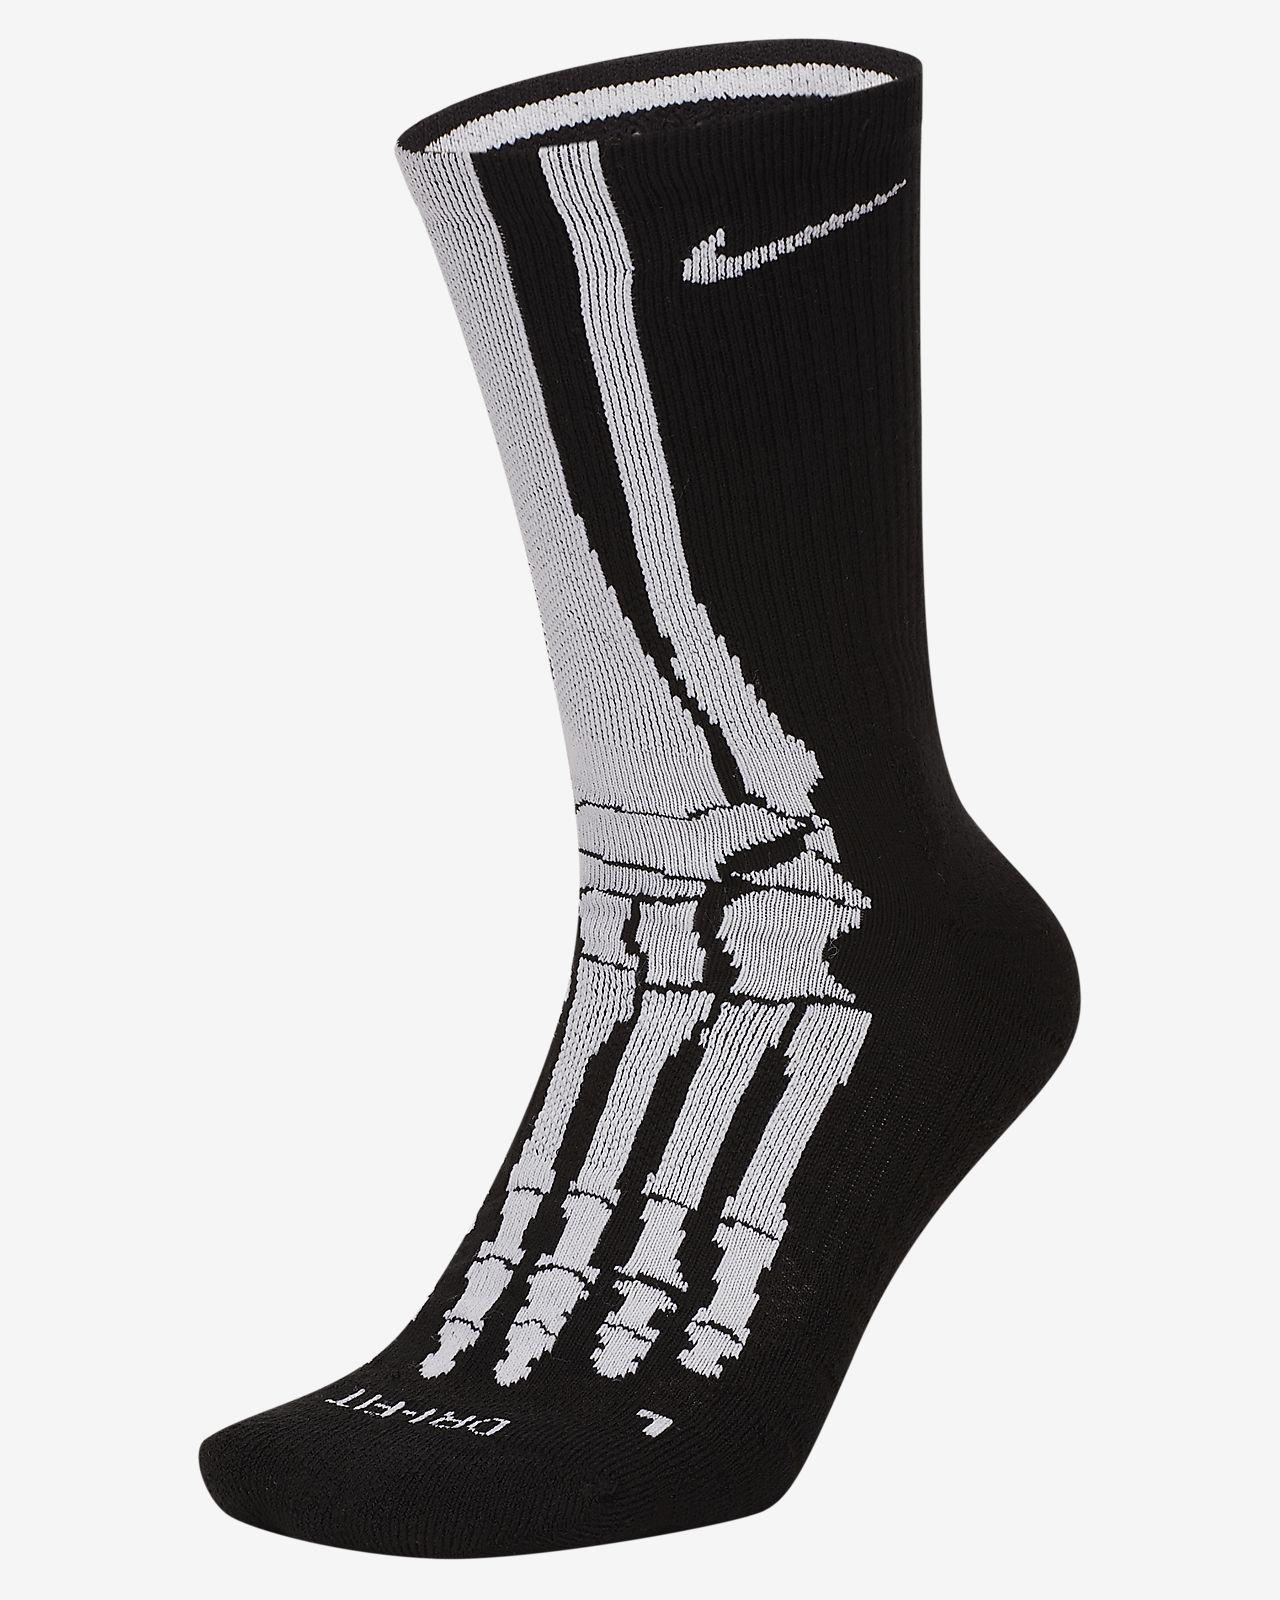 Nike Everyday Plus Skeleton 训练运动袜(1 双)